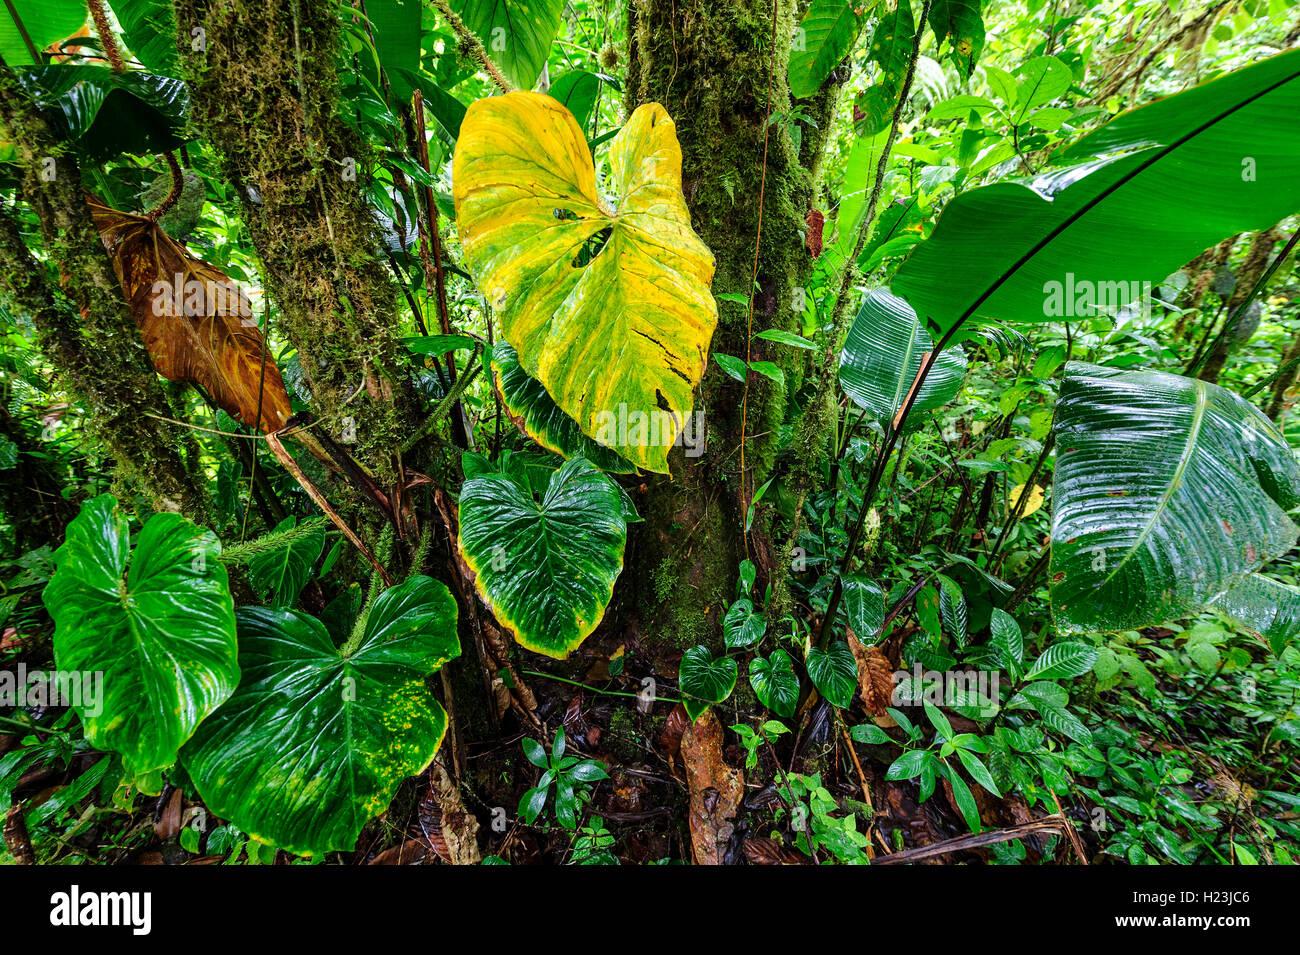 Rainforest vegetation, Corcovado National Park, Costa Rica - Stock Image